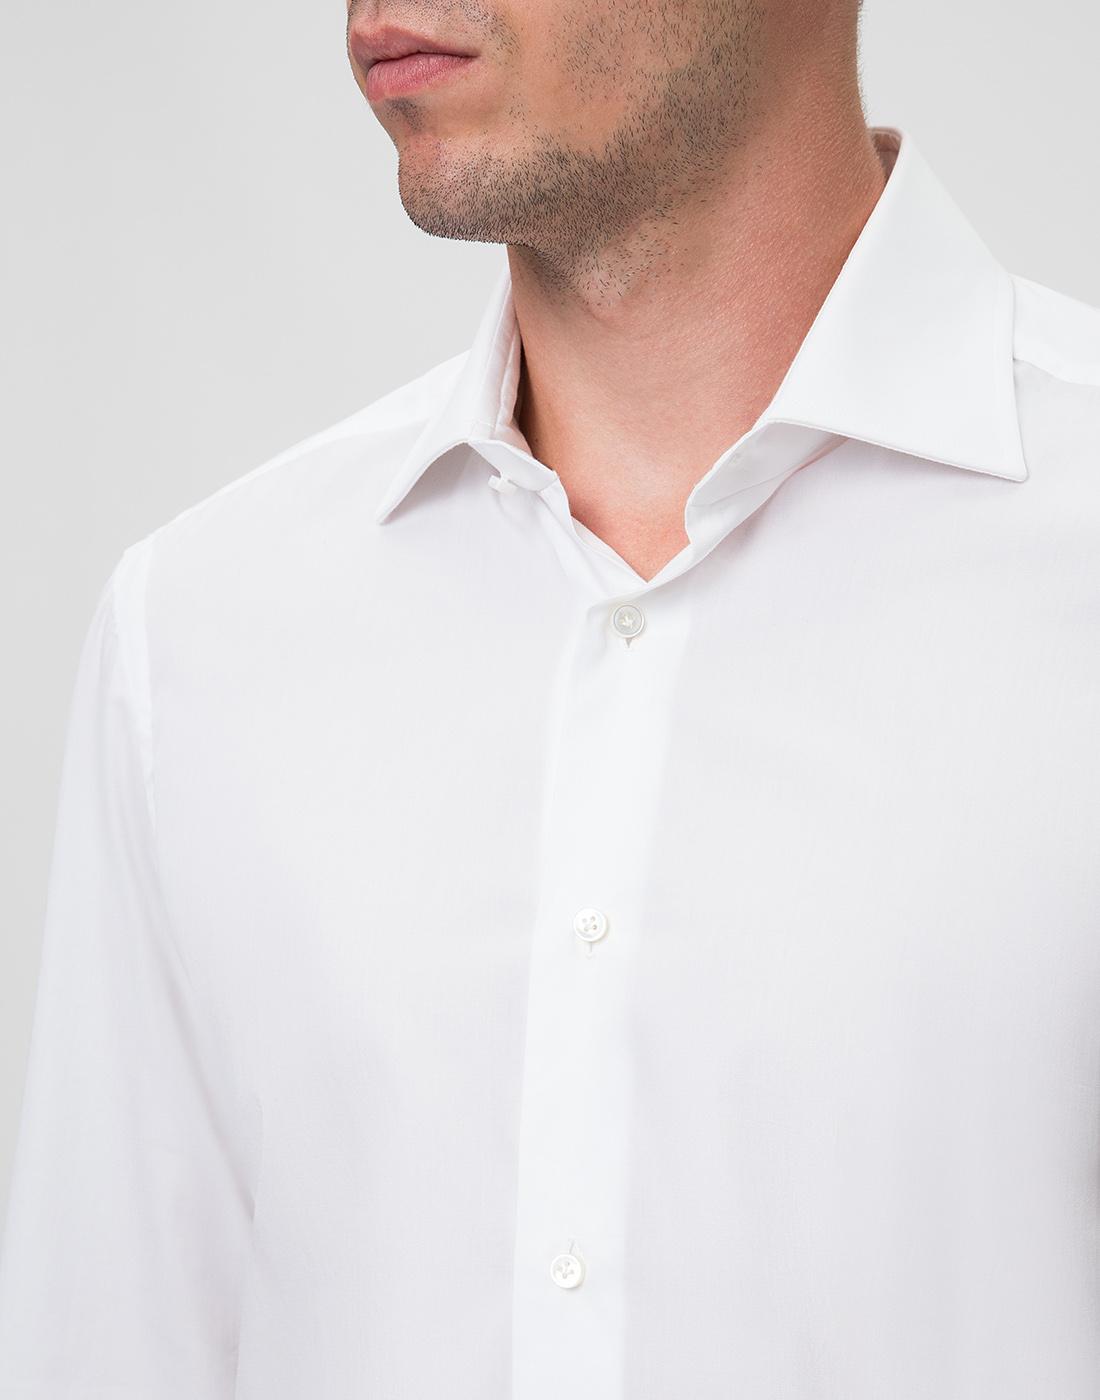 Мужская белая рубашка Barba SD2U634540301U-6